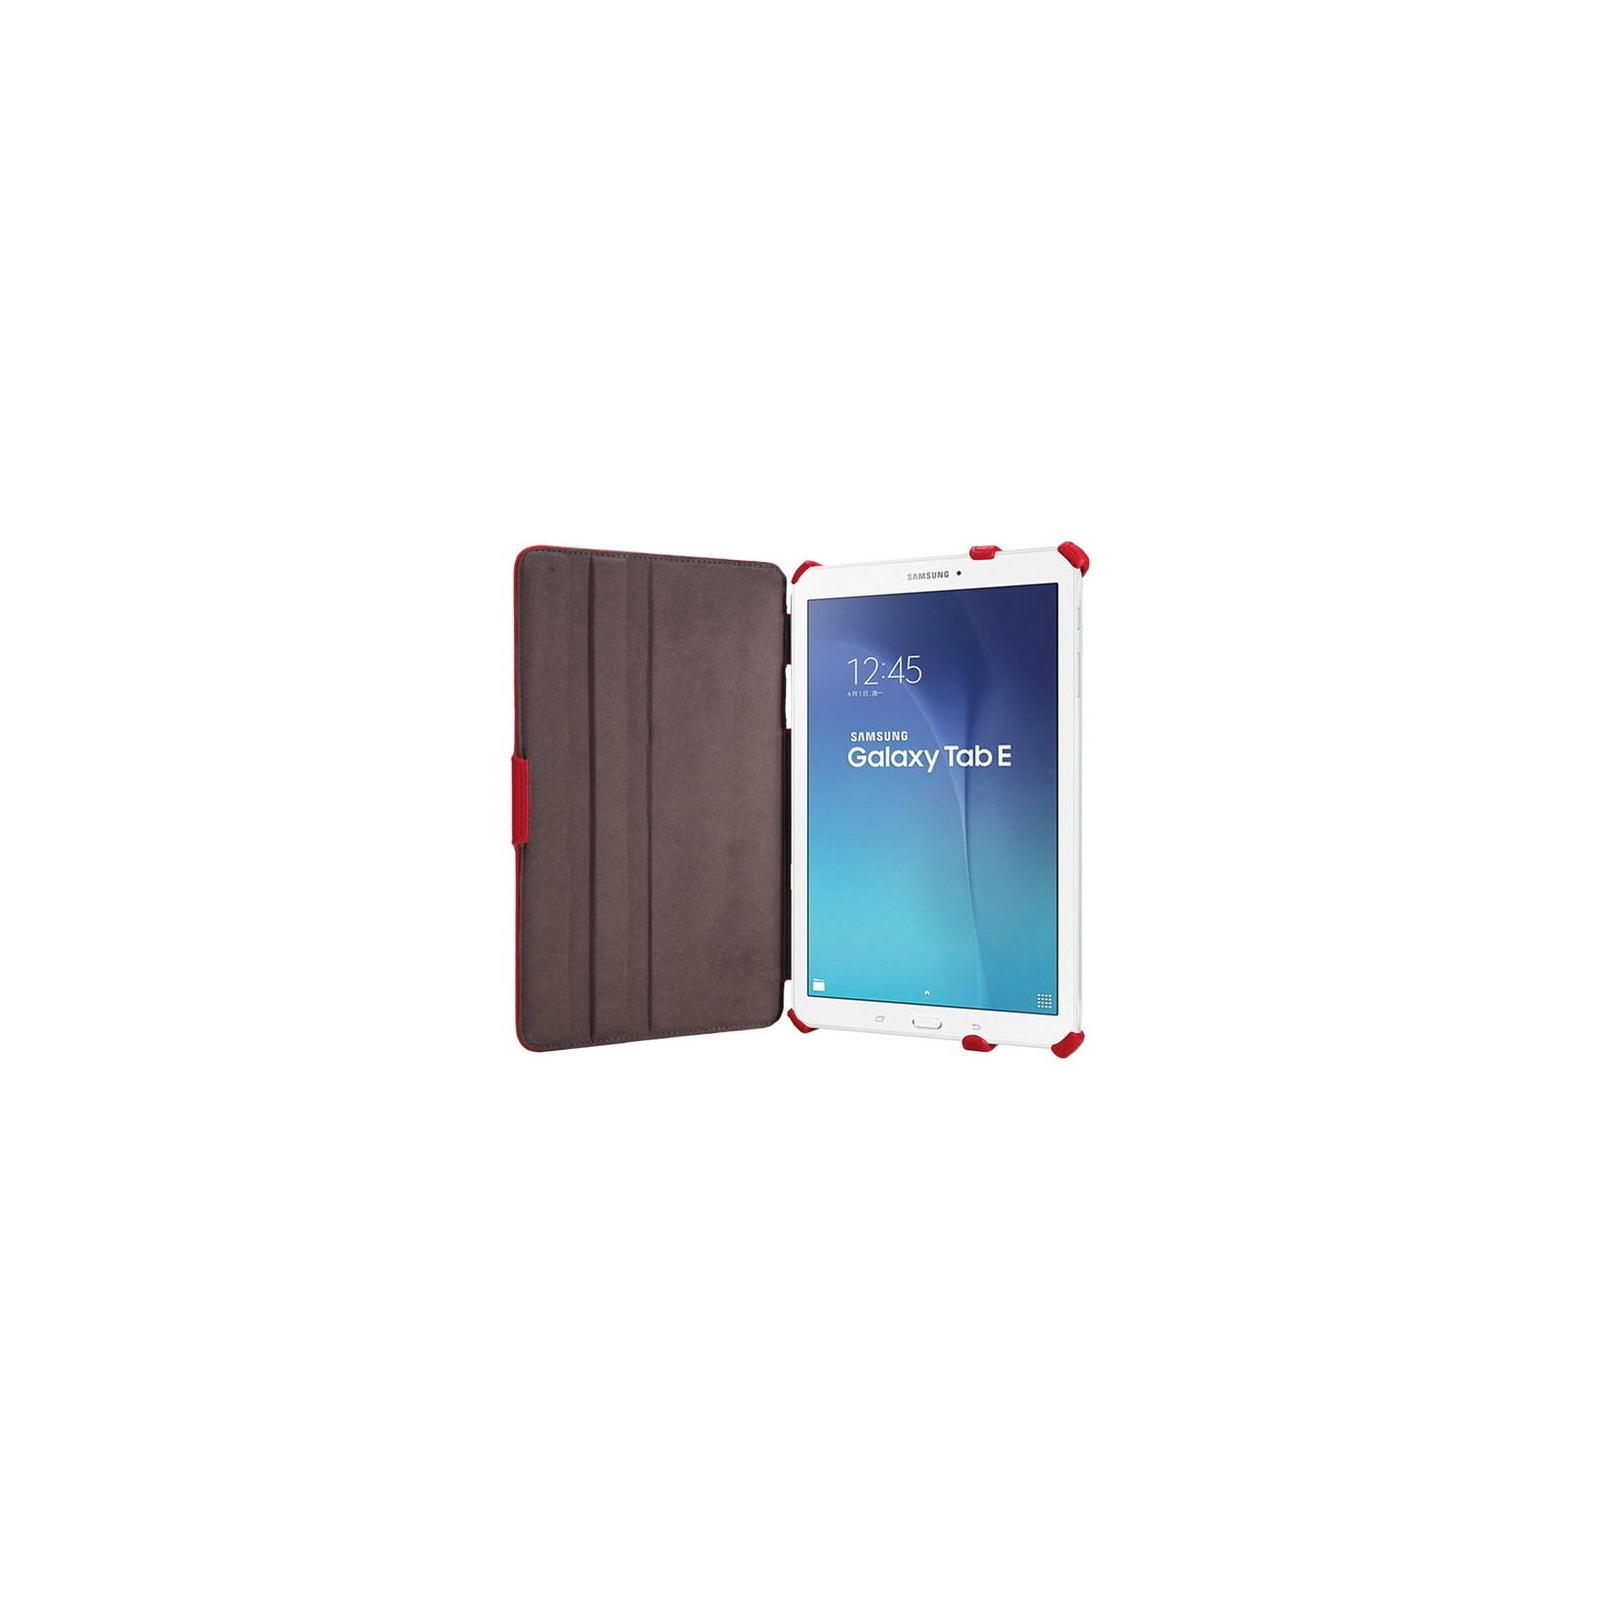 Чехол для планшета AirOn для Samsung Galaxy Tab E 9.6 red (4822352777258) изображение 8